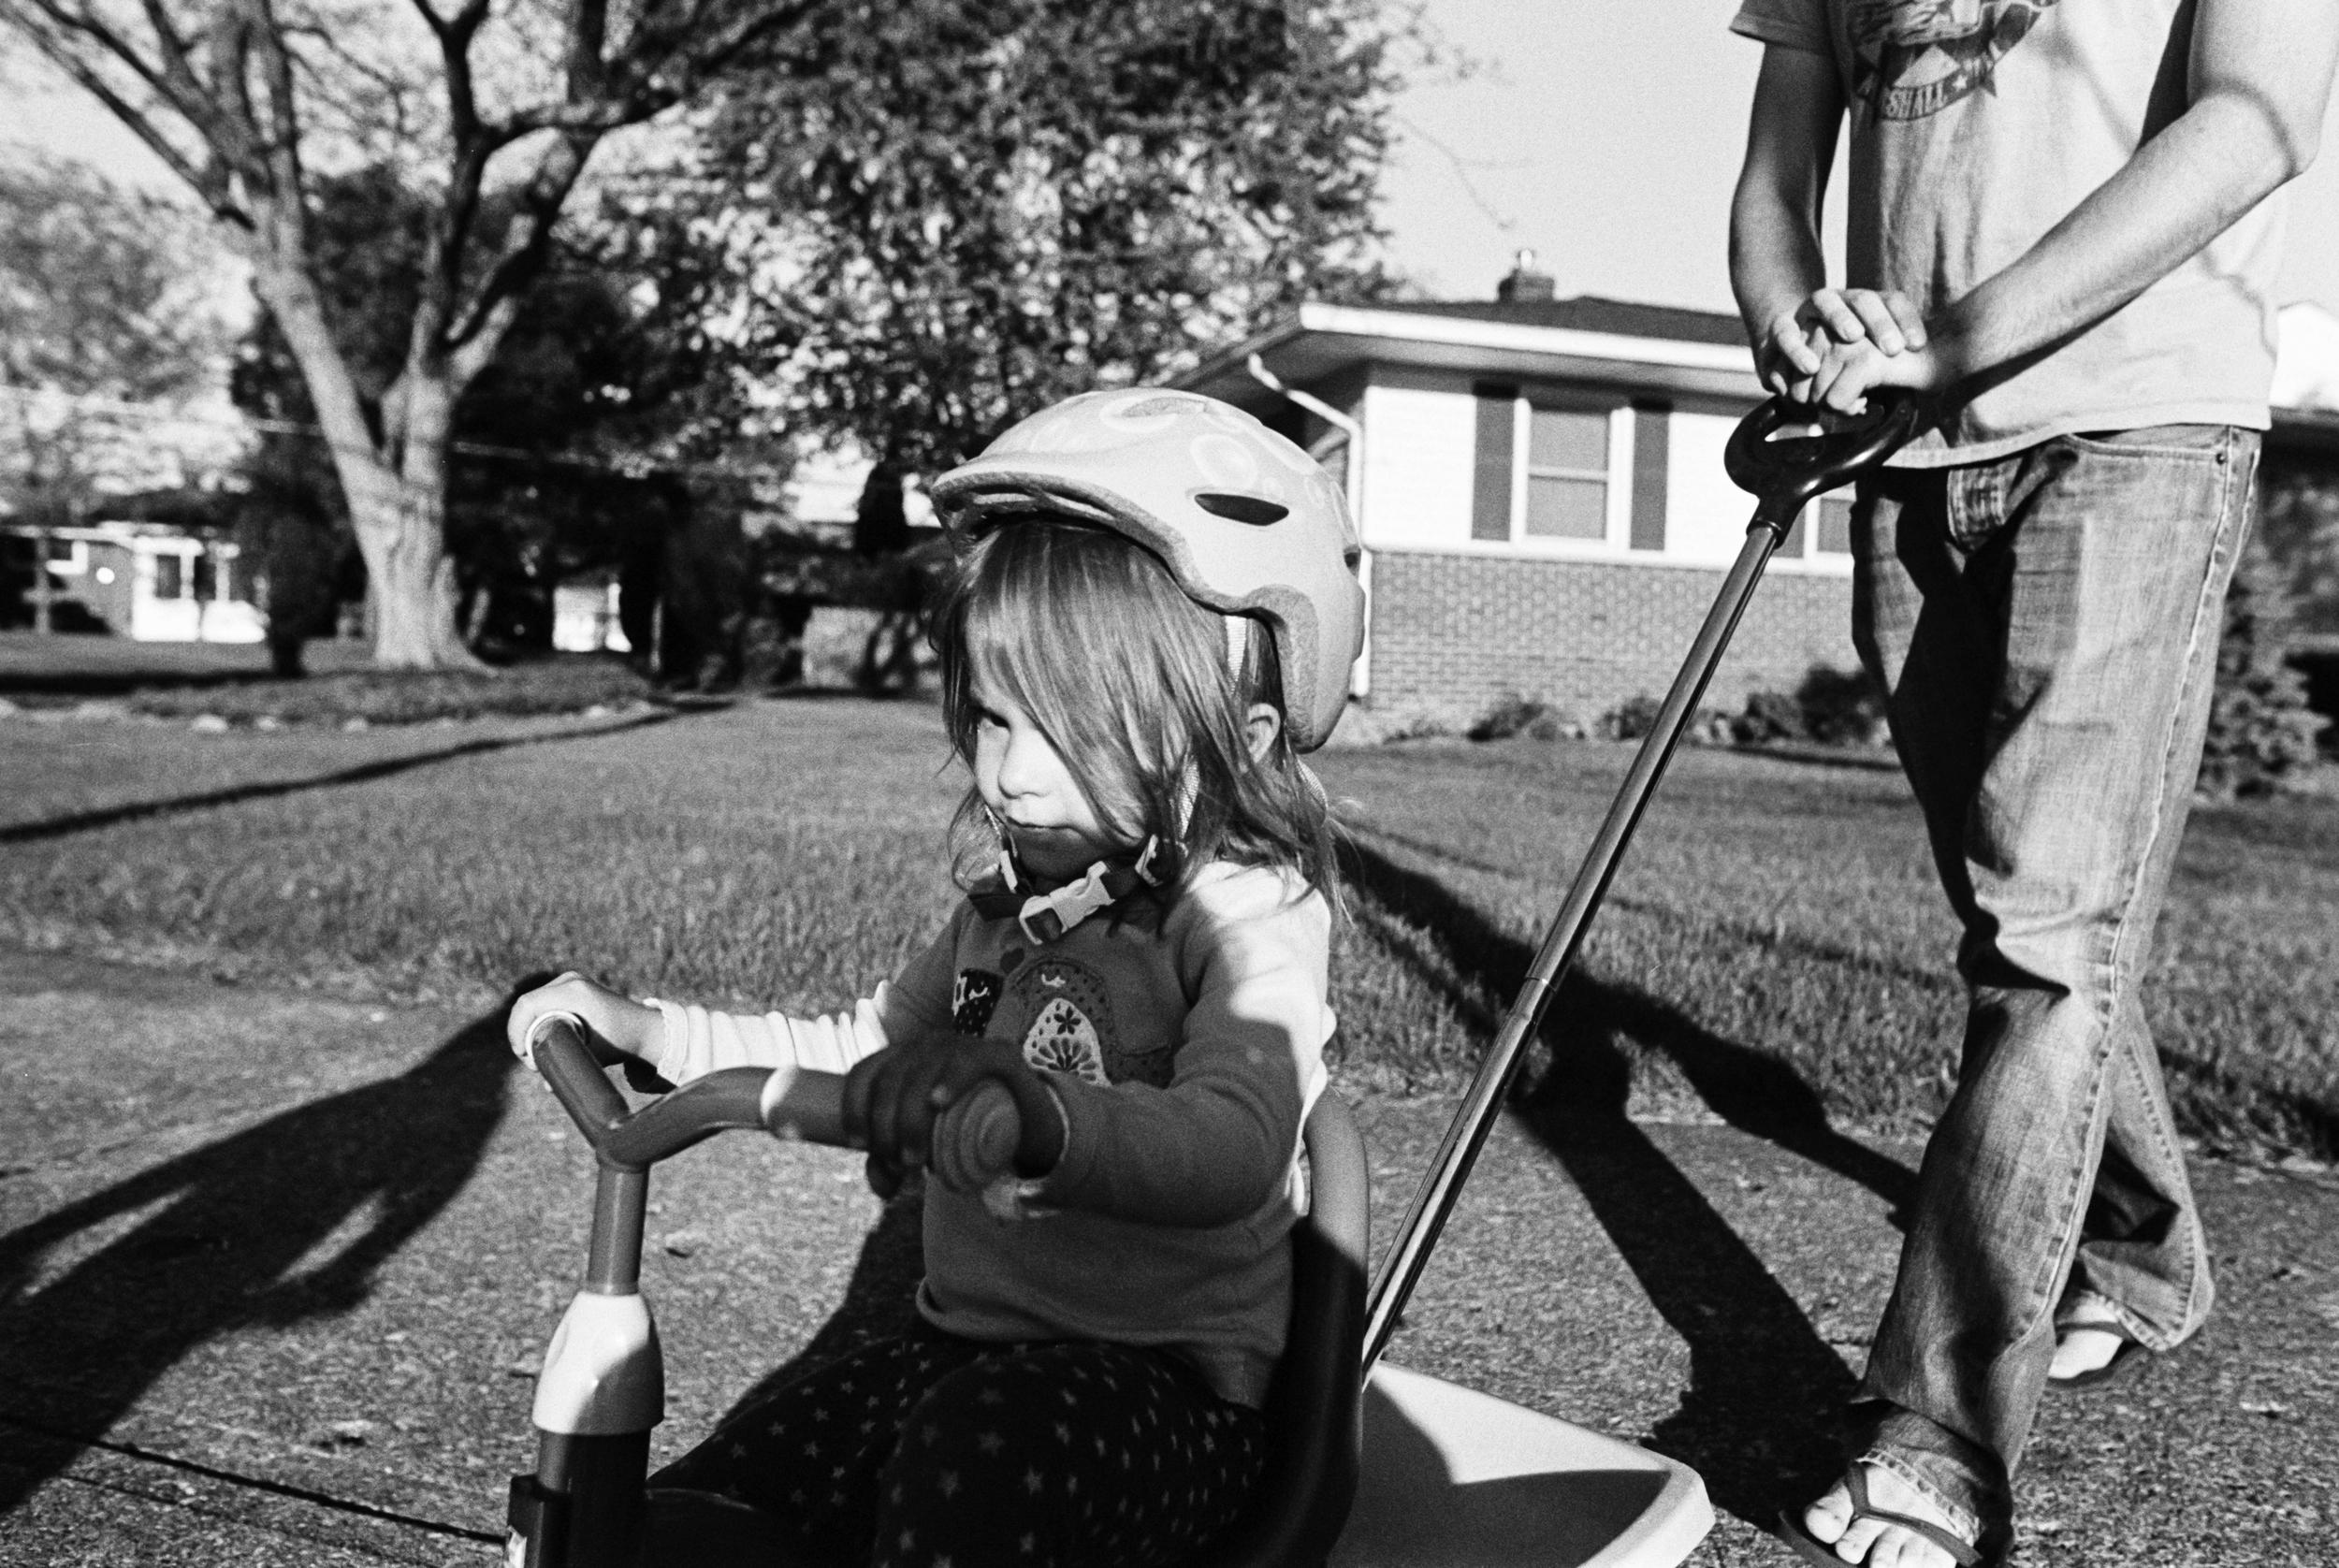 Kodak400TriX_rated200_May2016-17.jpg